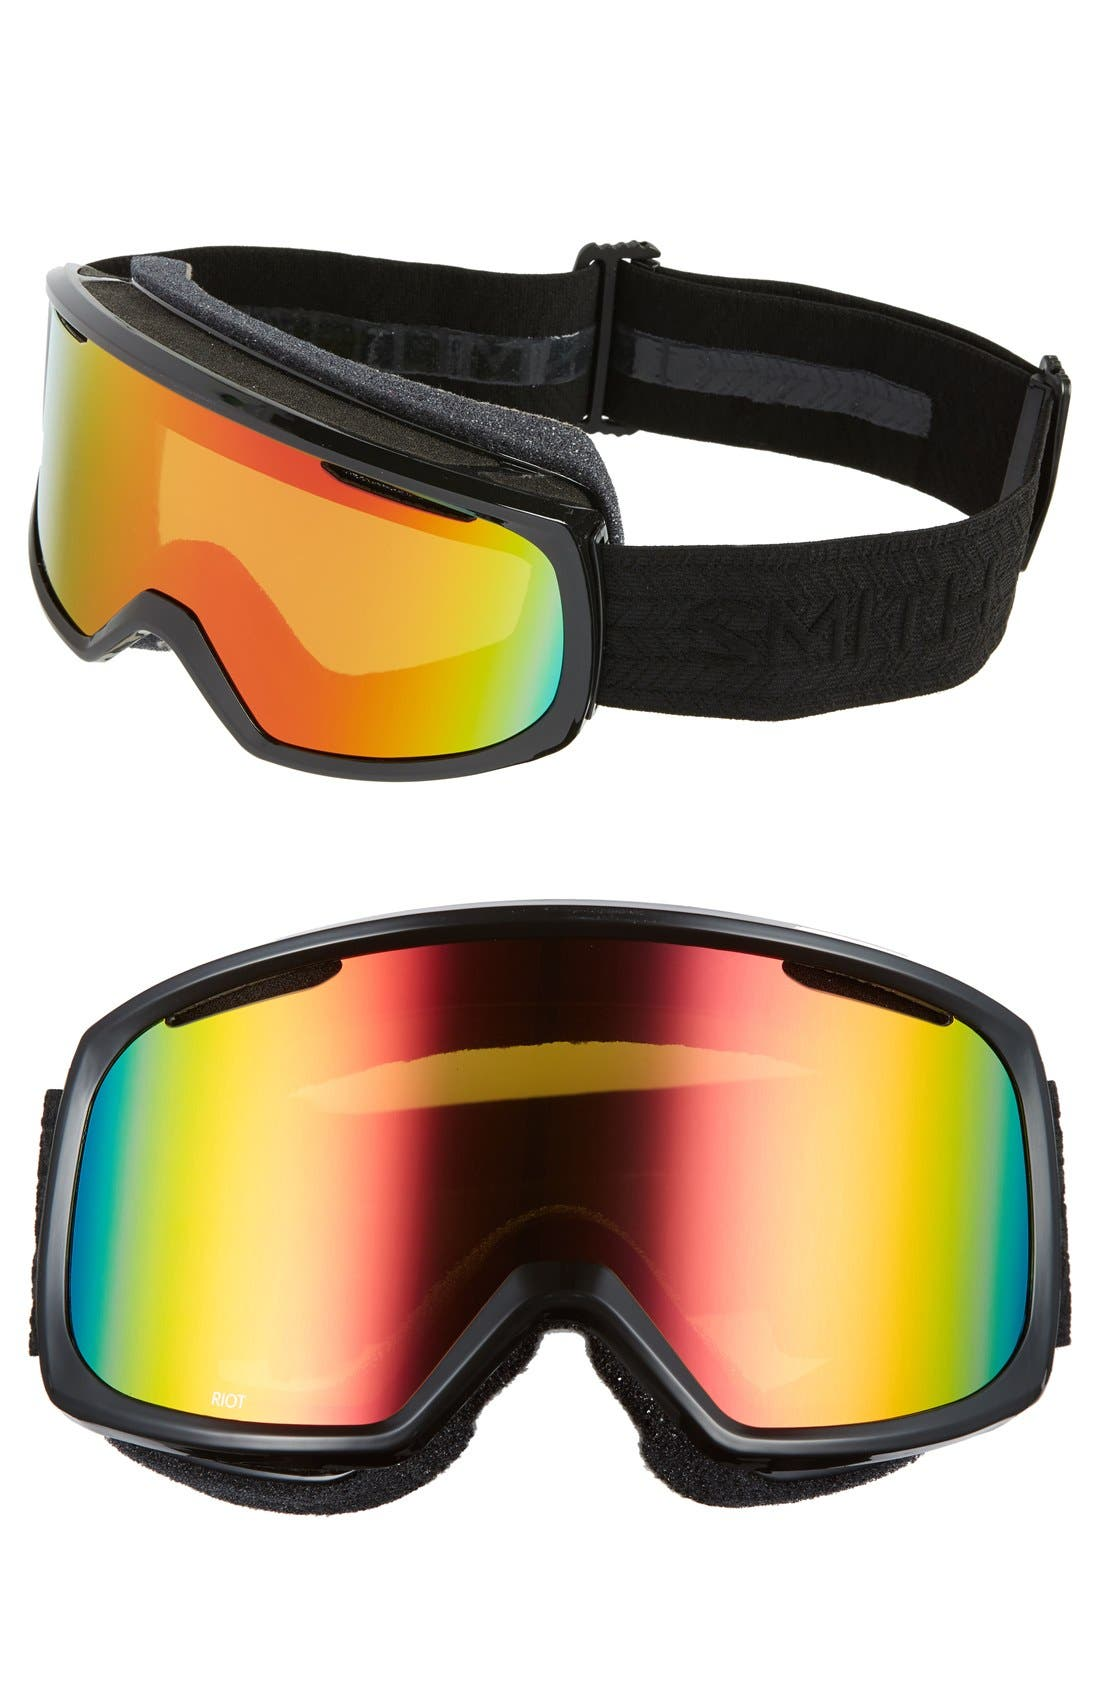 Smith 'Riot' Snow Goggles